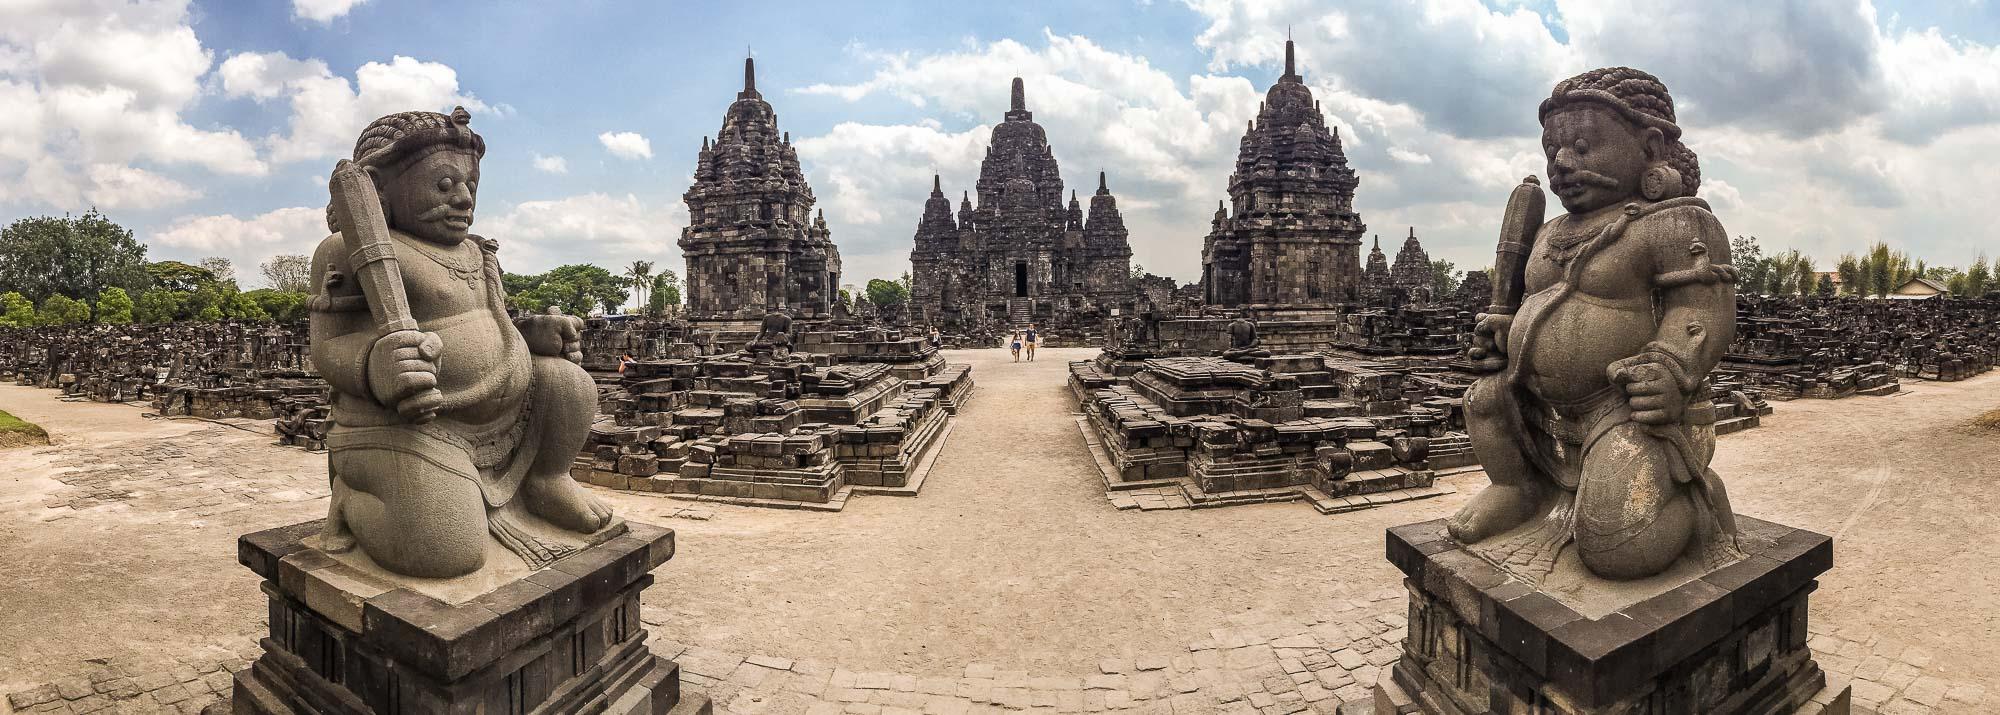 INDONESIA_2015_02 BOROBODUR-PRAMBANAN-YOGYA_JusMedic_265